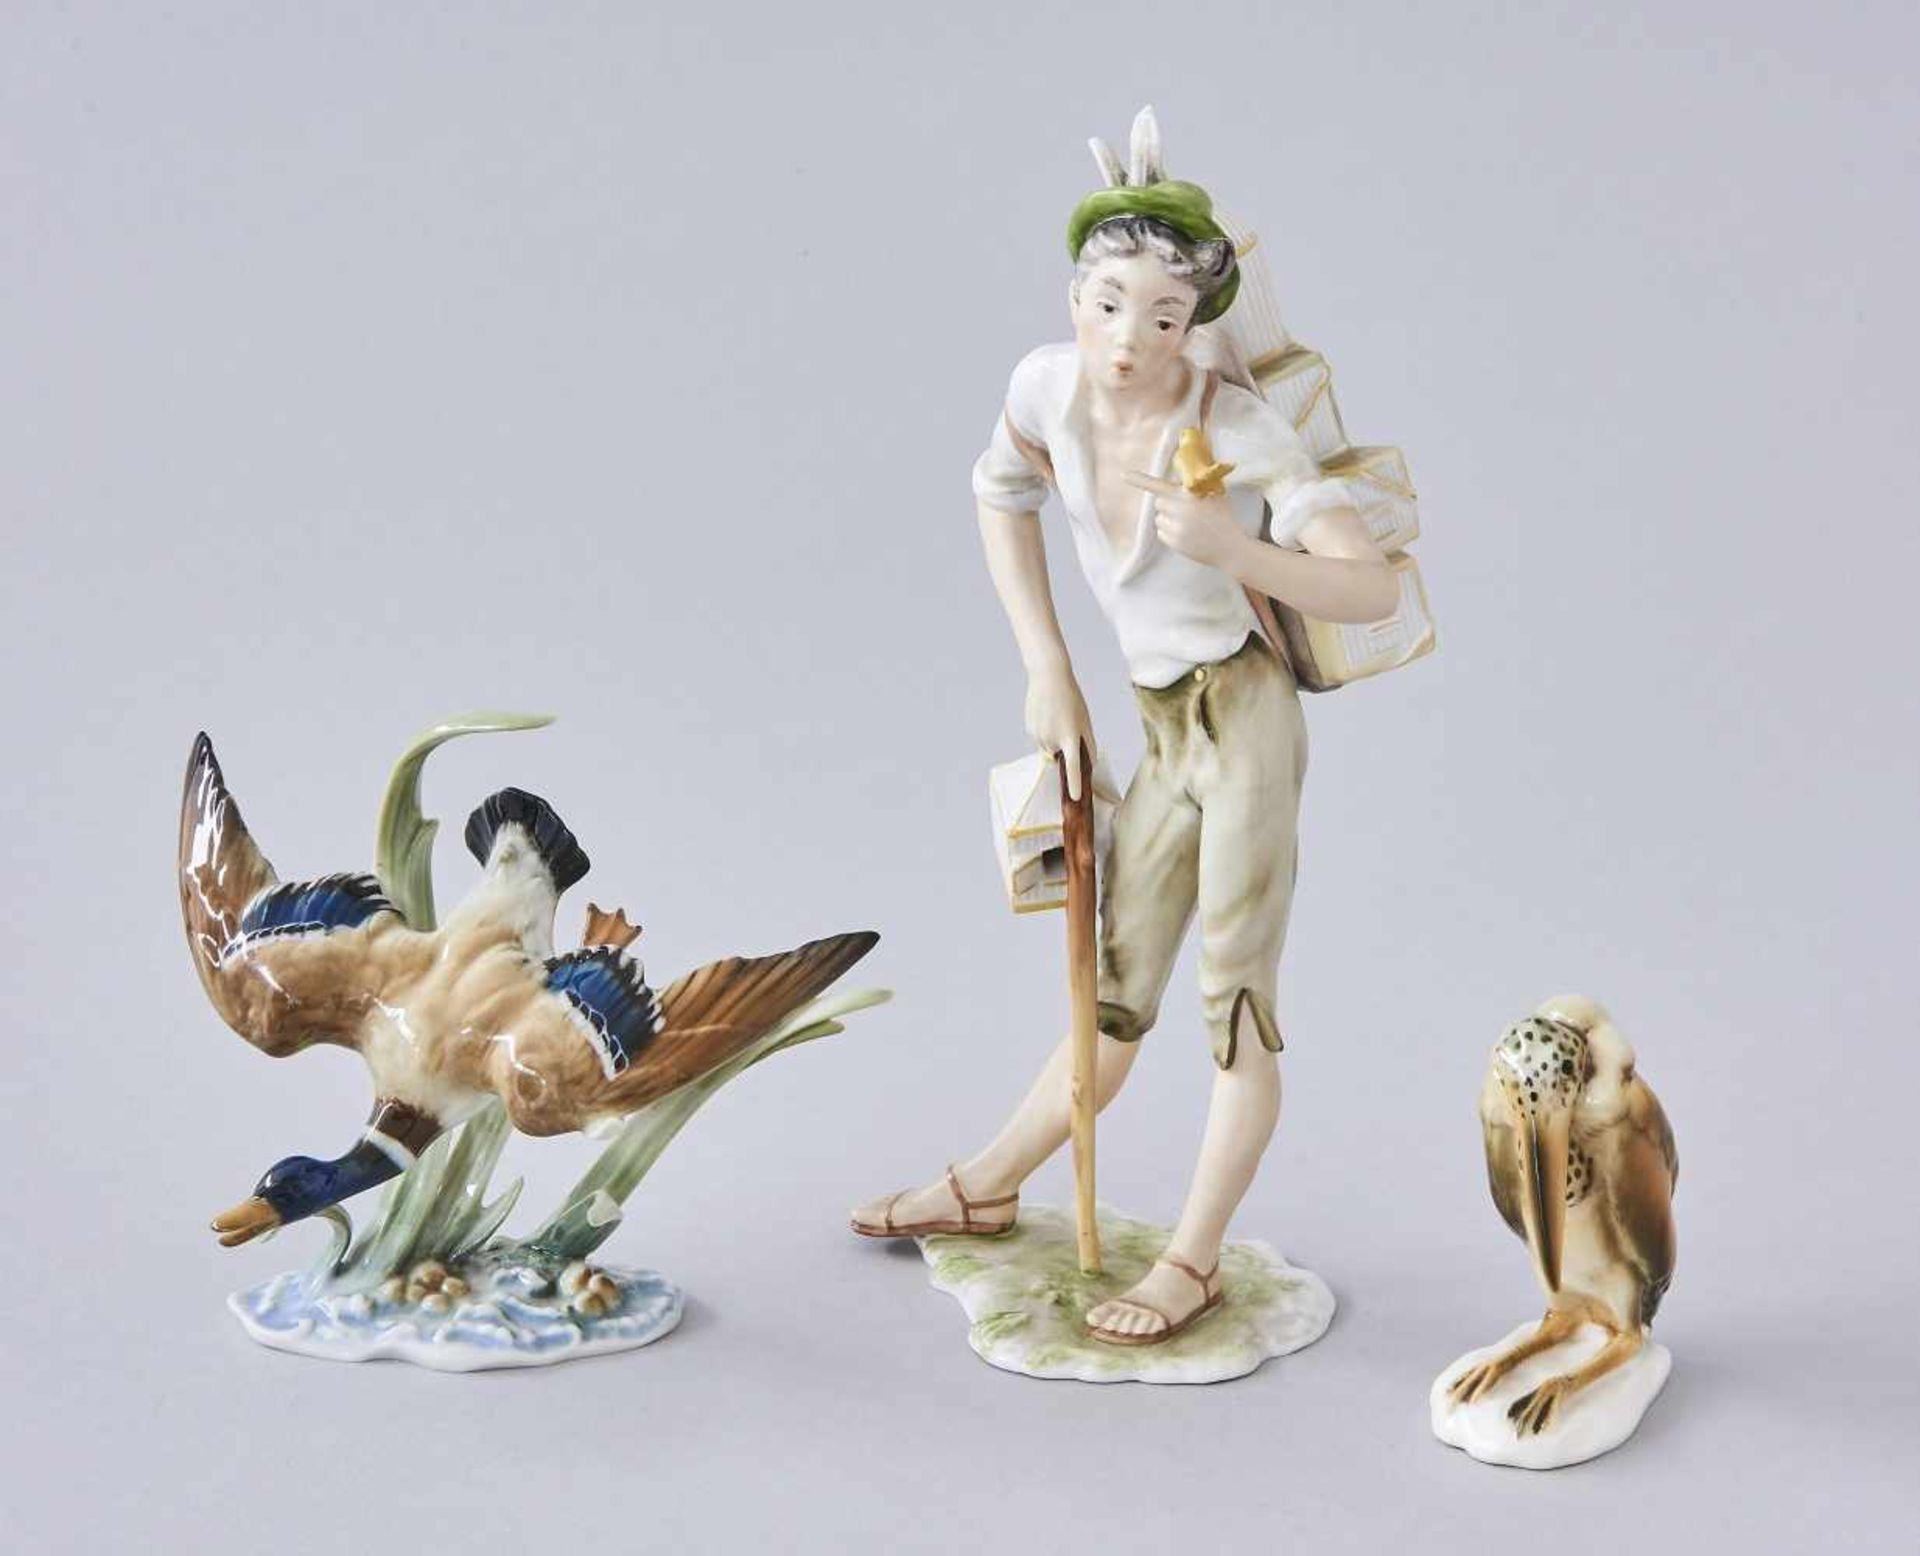 Los 17 - Konvolut drei PorzellanfigurenVogelmeister, Alka Kunst Bavaria, Höhe 22,5 cm, Wildente,